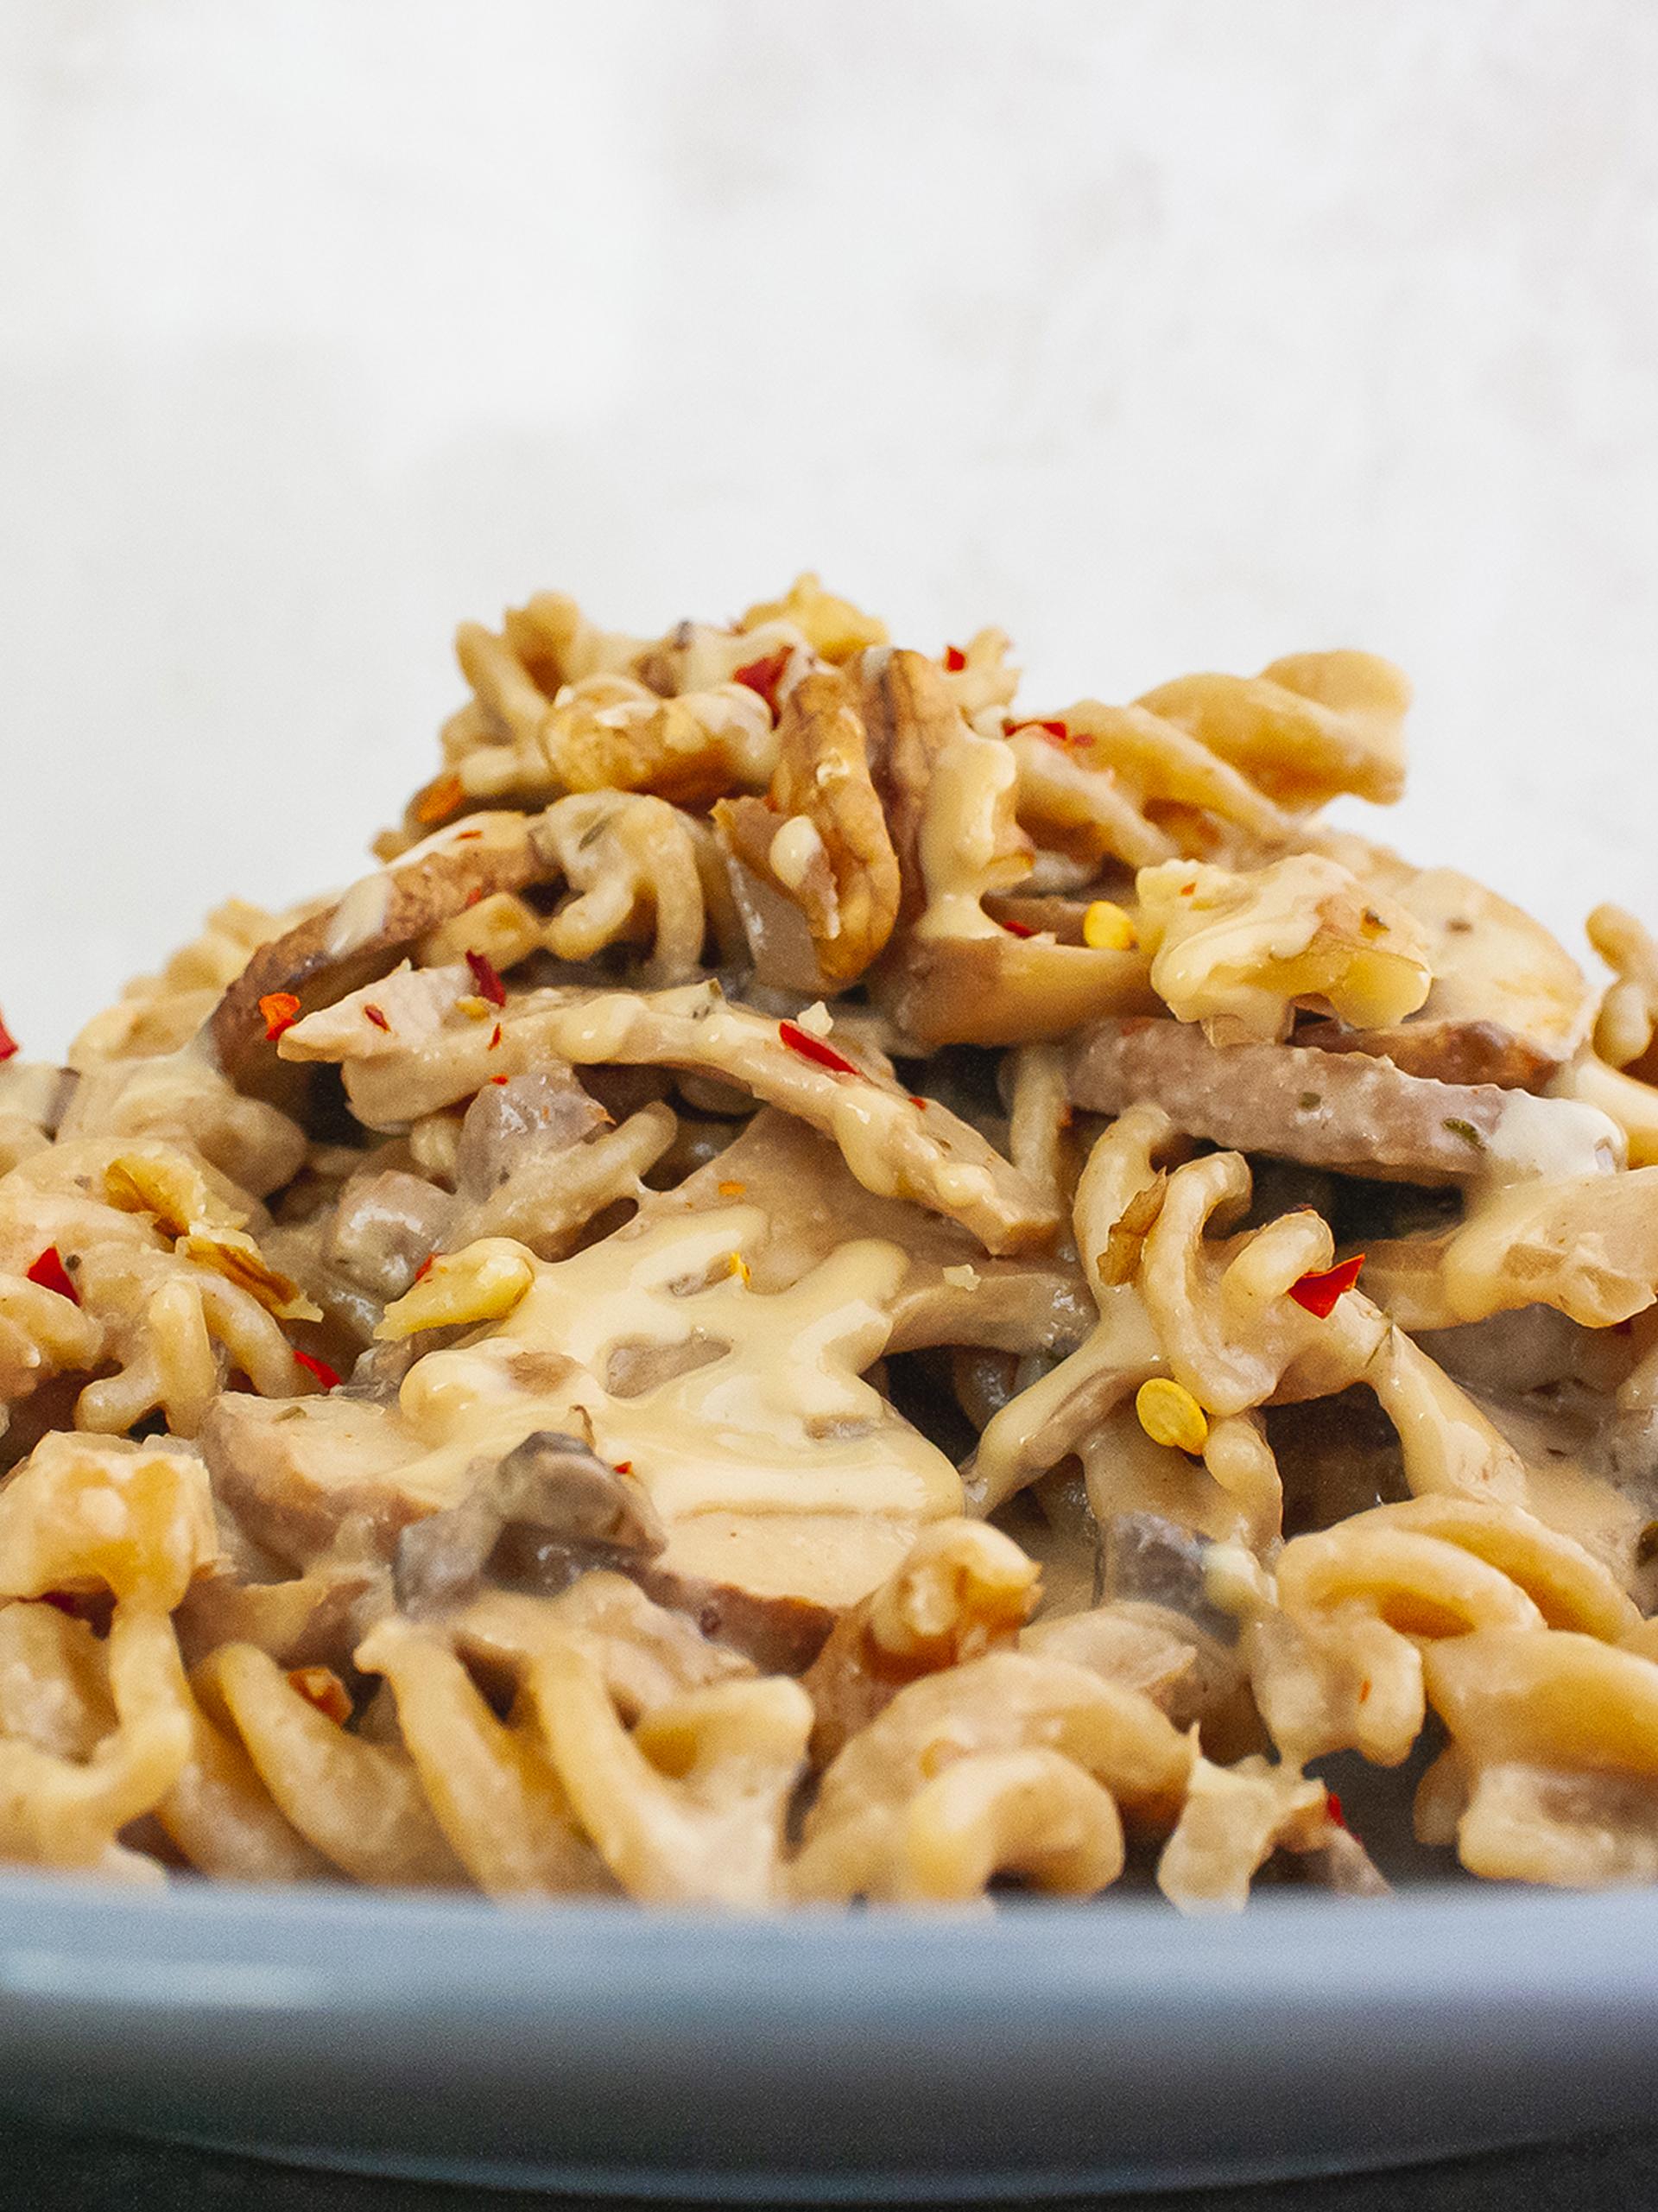 Vegan No Cream Tahini Pasta with Mushrooms Thumbnail